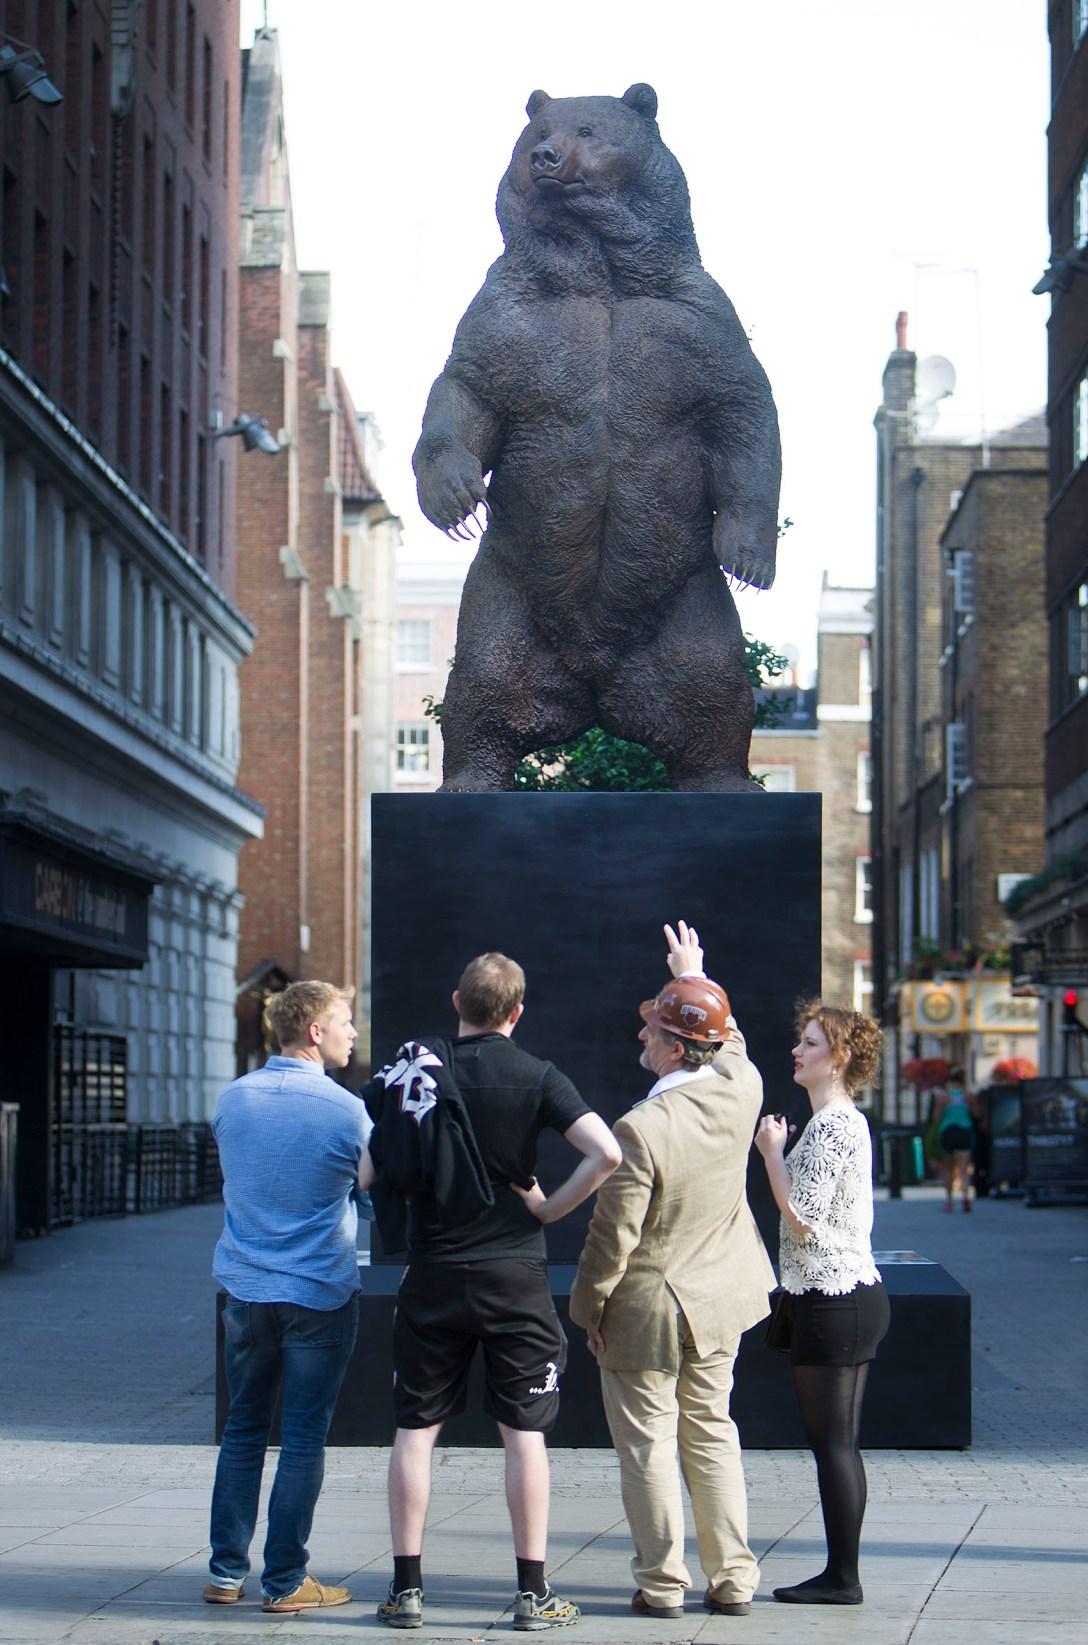 'Bronze' 'sculpture' by Nick Bibby, 'cast' at Pangolin Edition